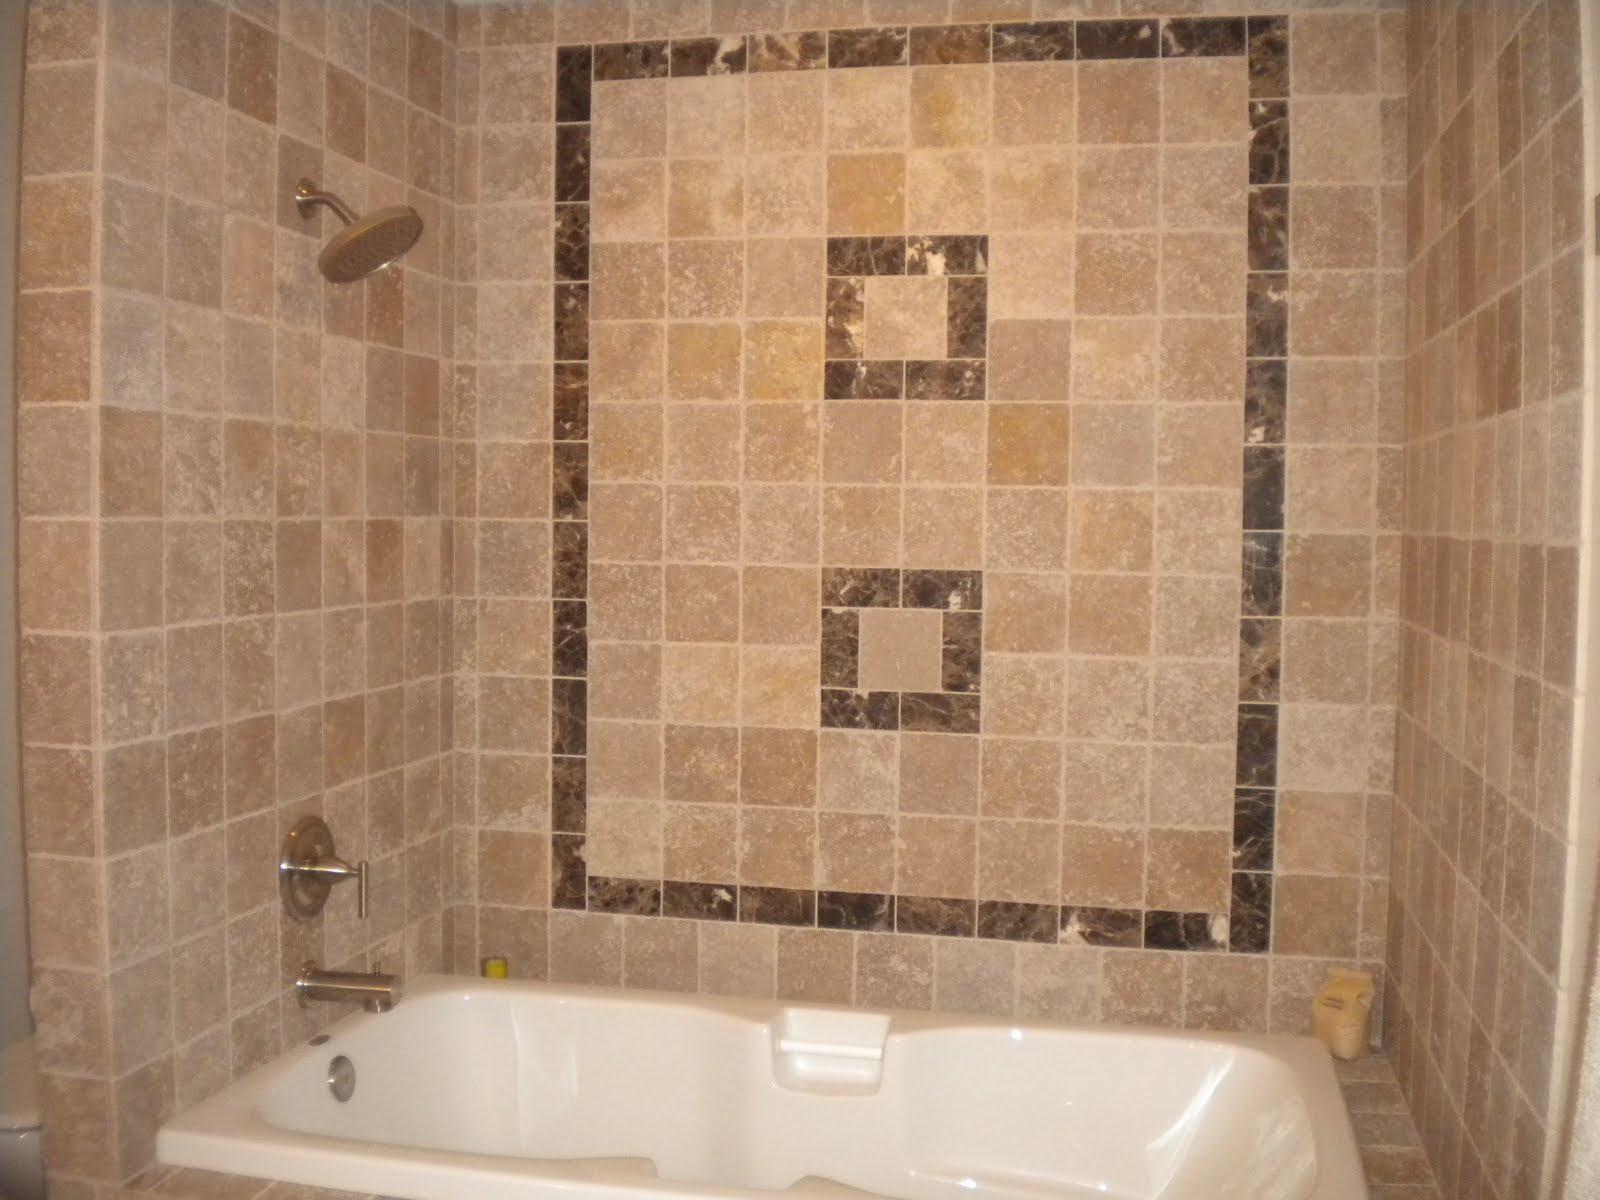 Metal & Glass Wall Tiles, Backsplashes, Mosaic Tile